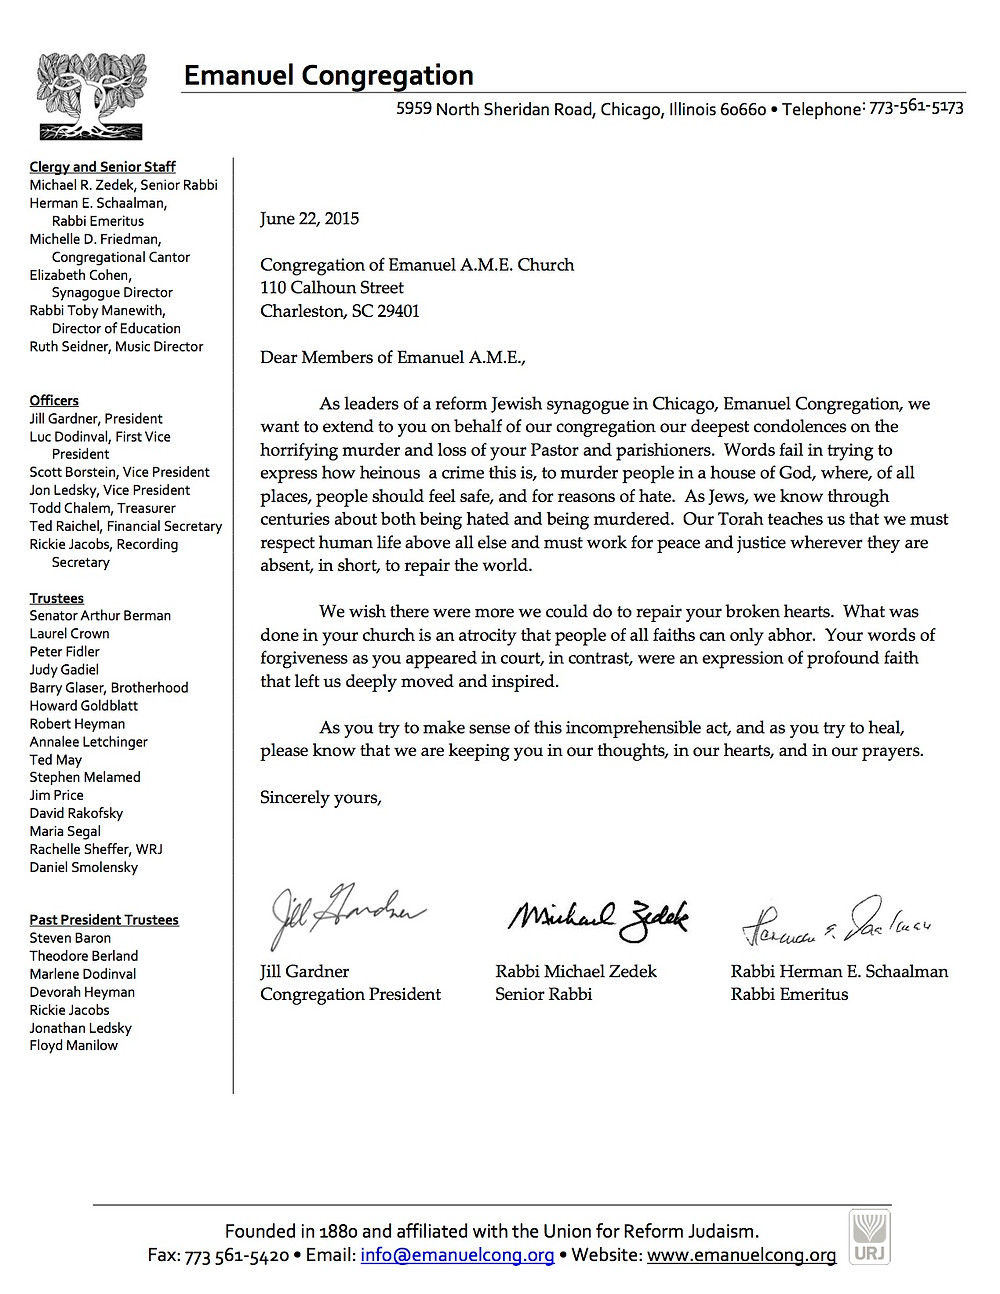 Condolence letter Charleston copy.jpg